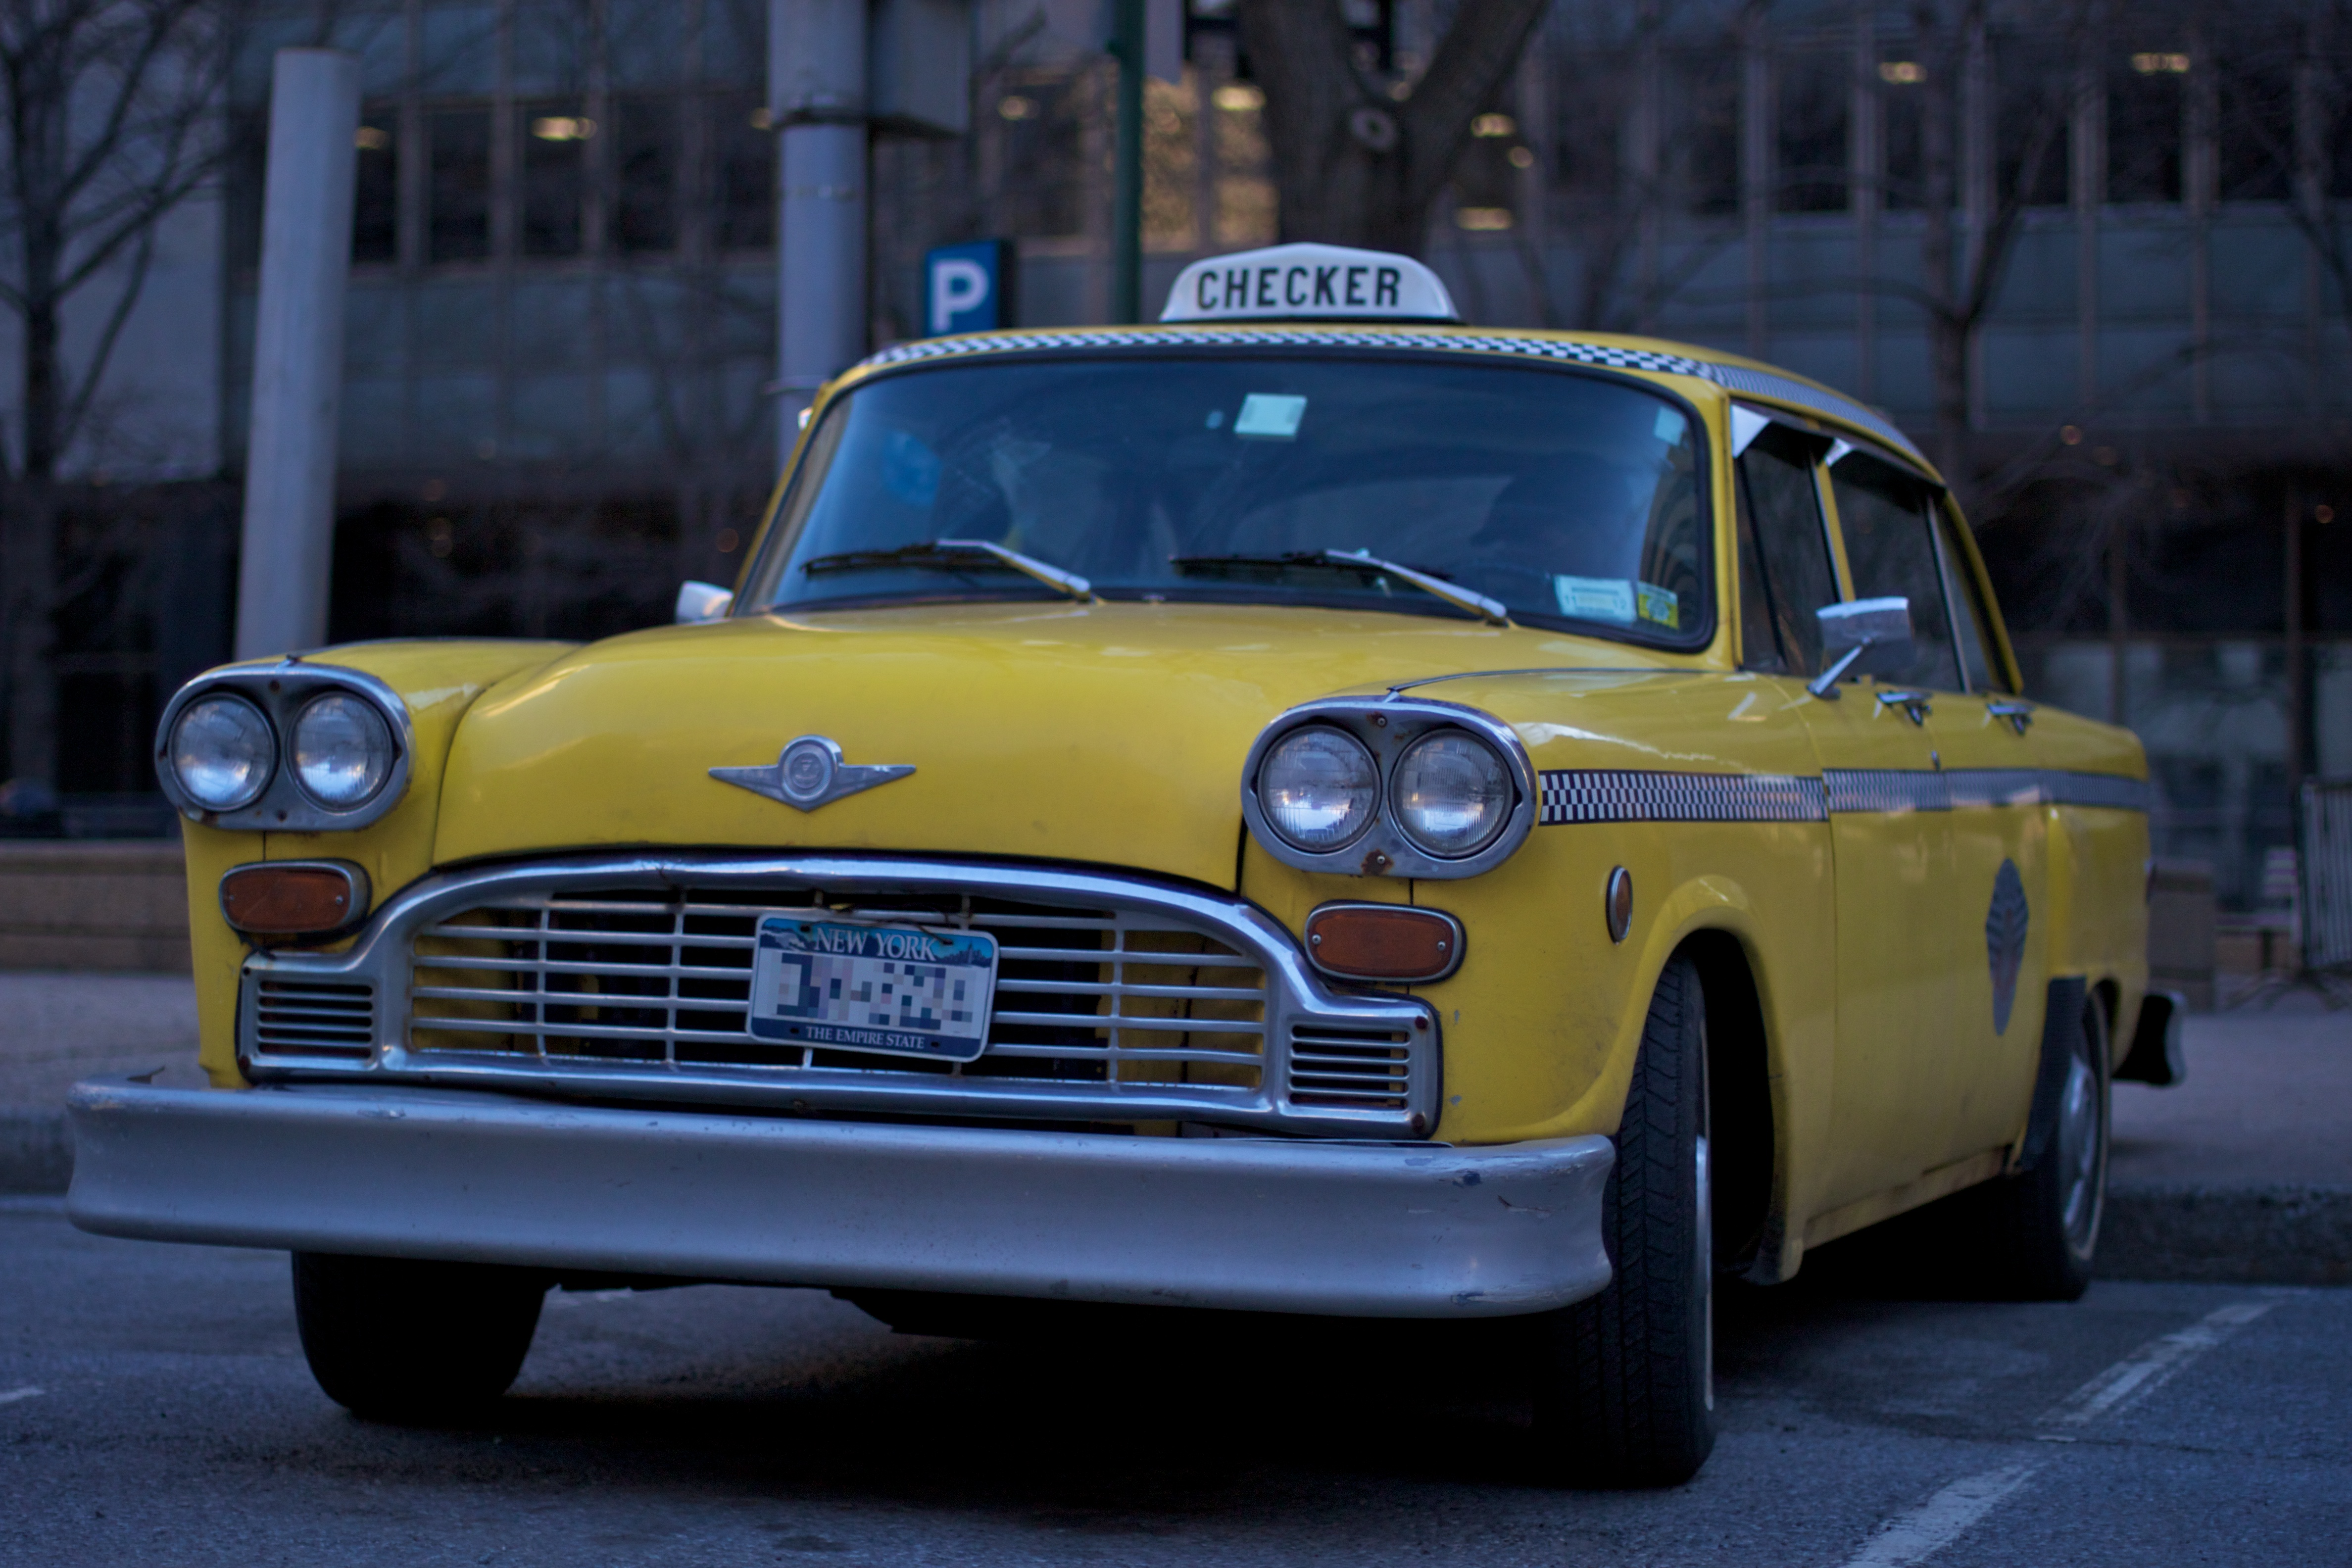 Checker taxi cab photos reviews news specs buy car - Order a cab ...